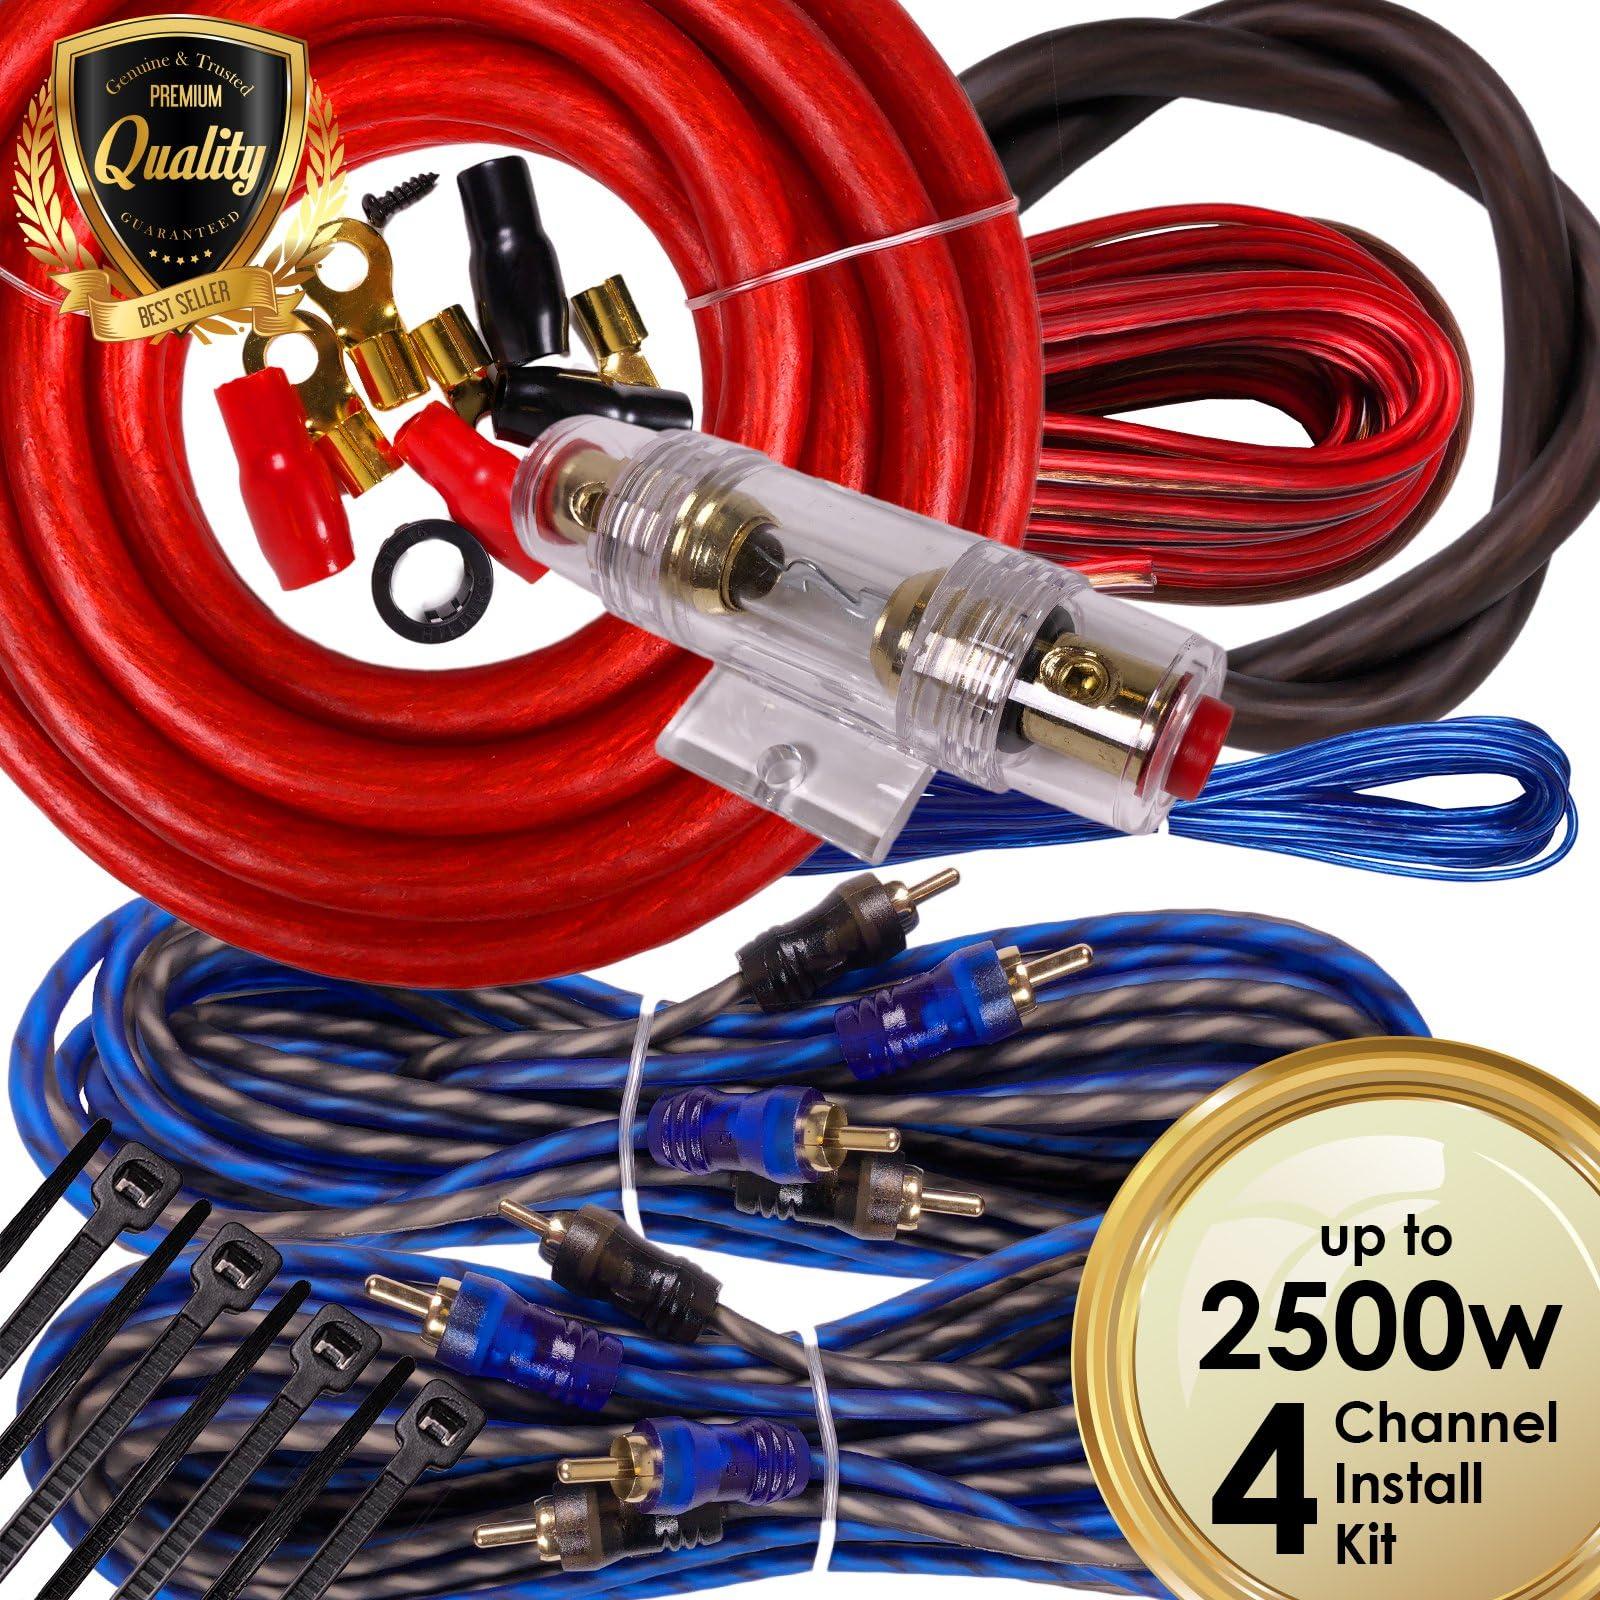 images na ssl images amazon com images i 918hkzsrh rh amazon com car amplifier wiring kit price in india car amp wiring kit